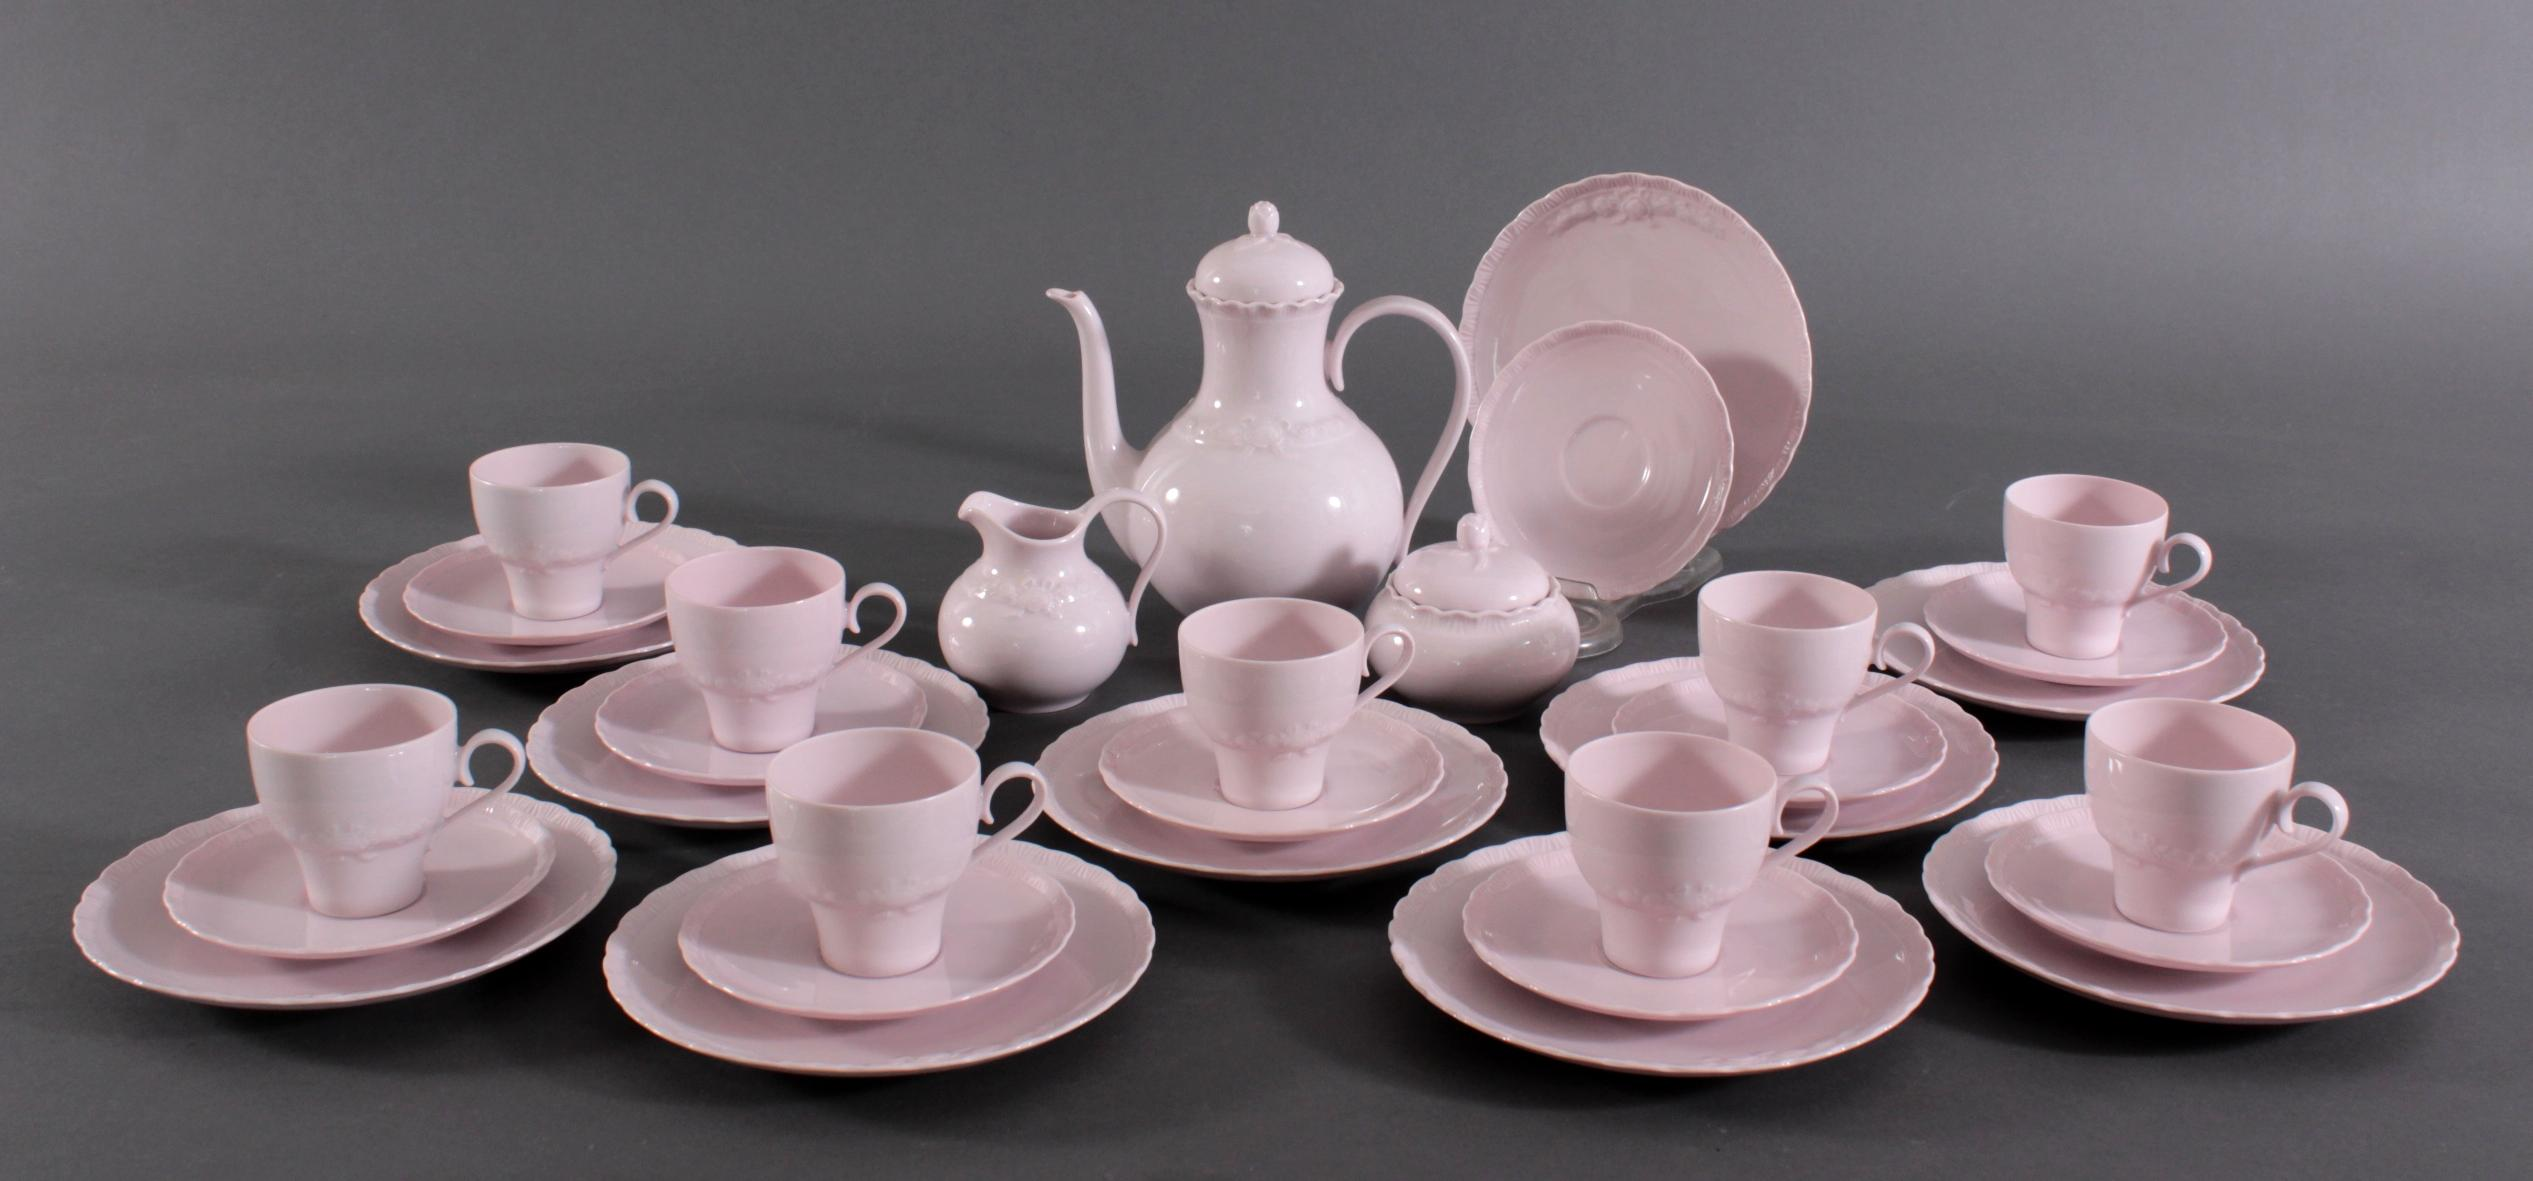 Hutschenreuther Kaffeeservice 'Porcelaine Rosé'